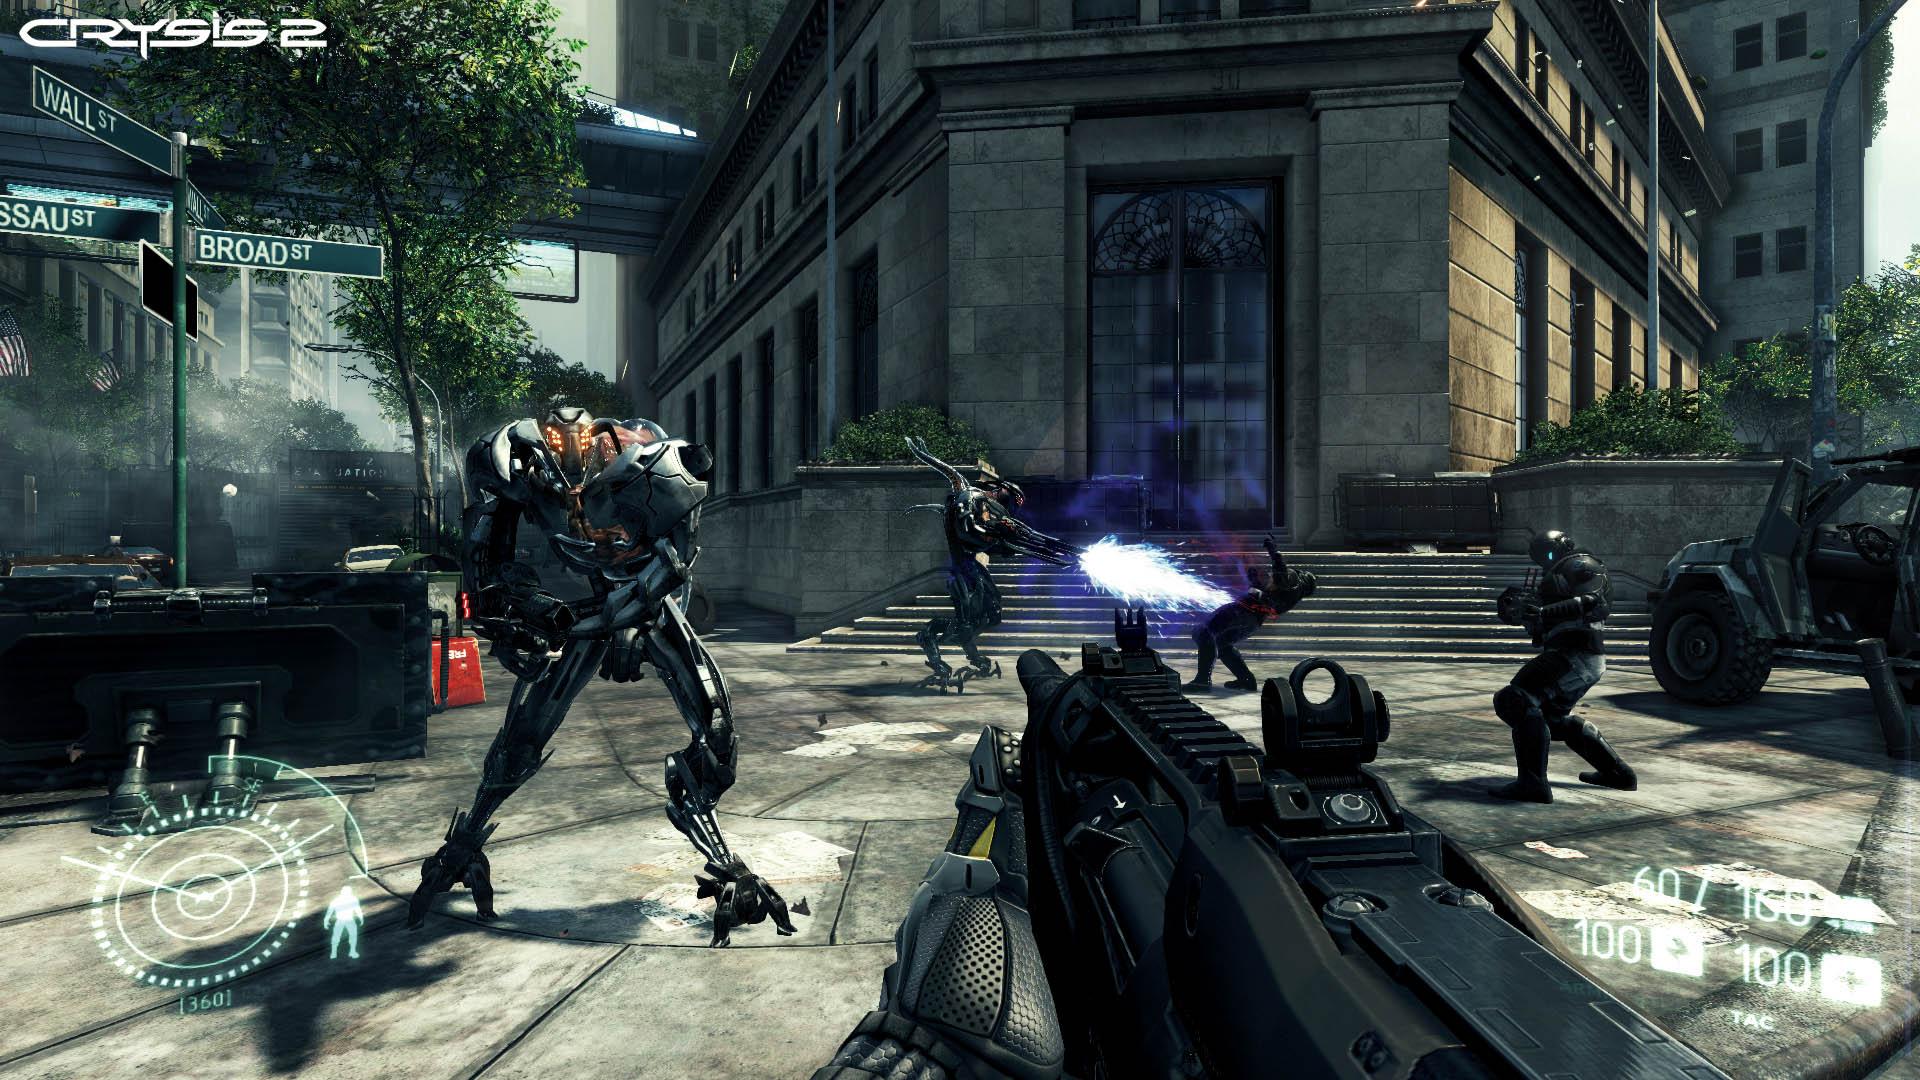 Crysis 2 - Gameplay Screenshots